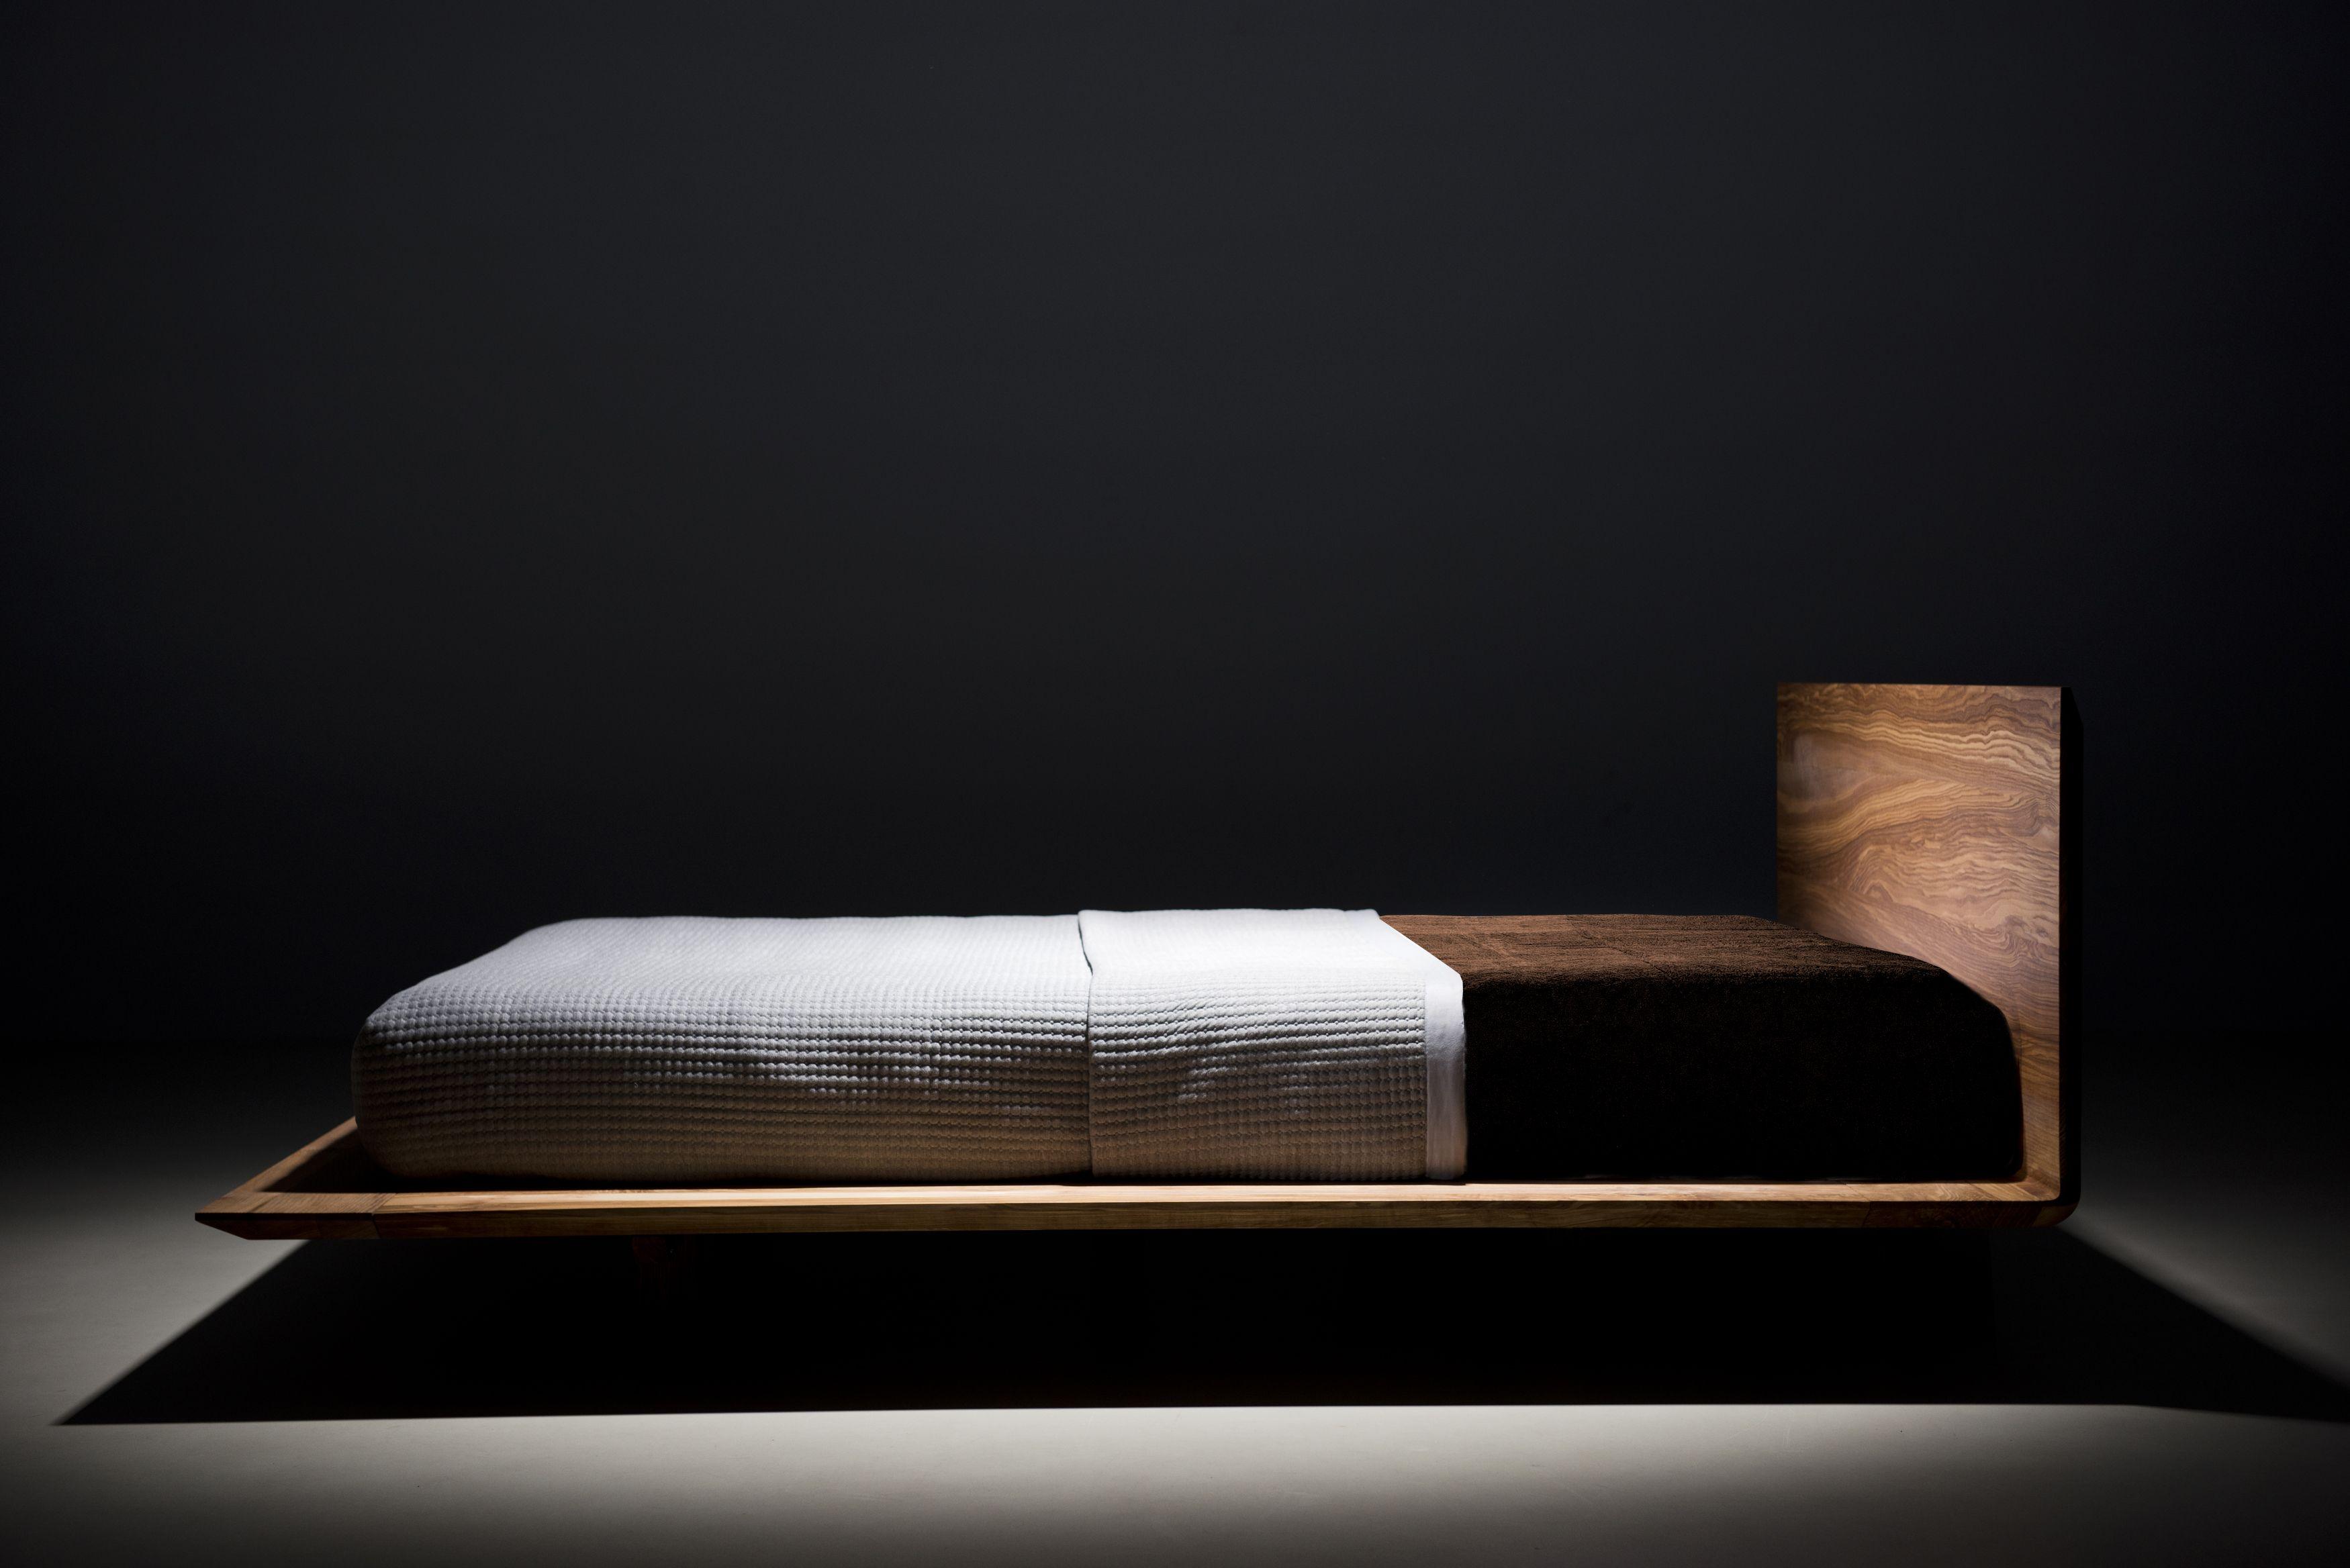 Slim Bett Design Schlicht Modern Aus Massivholz Edler Eleganter